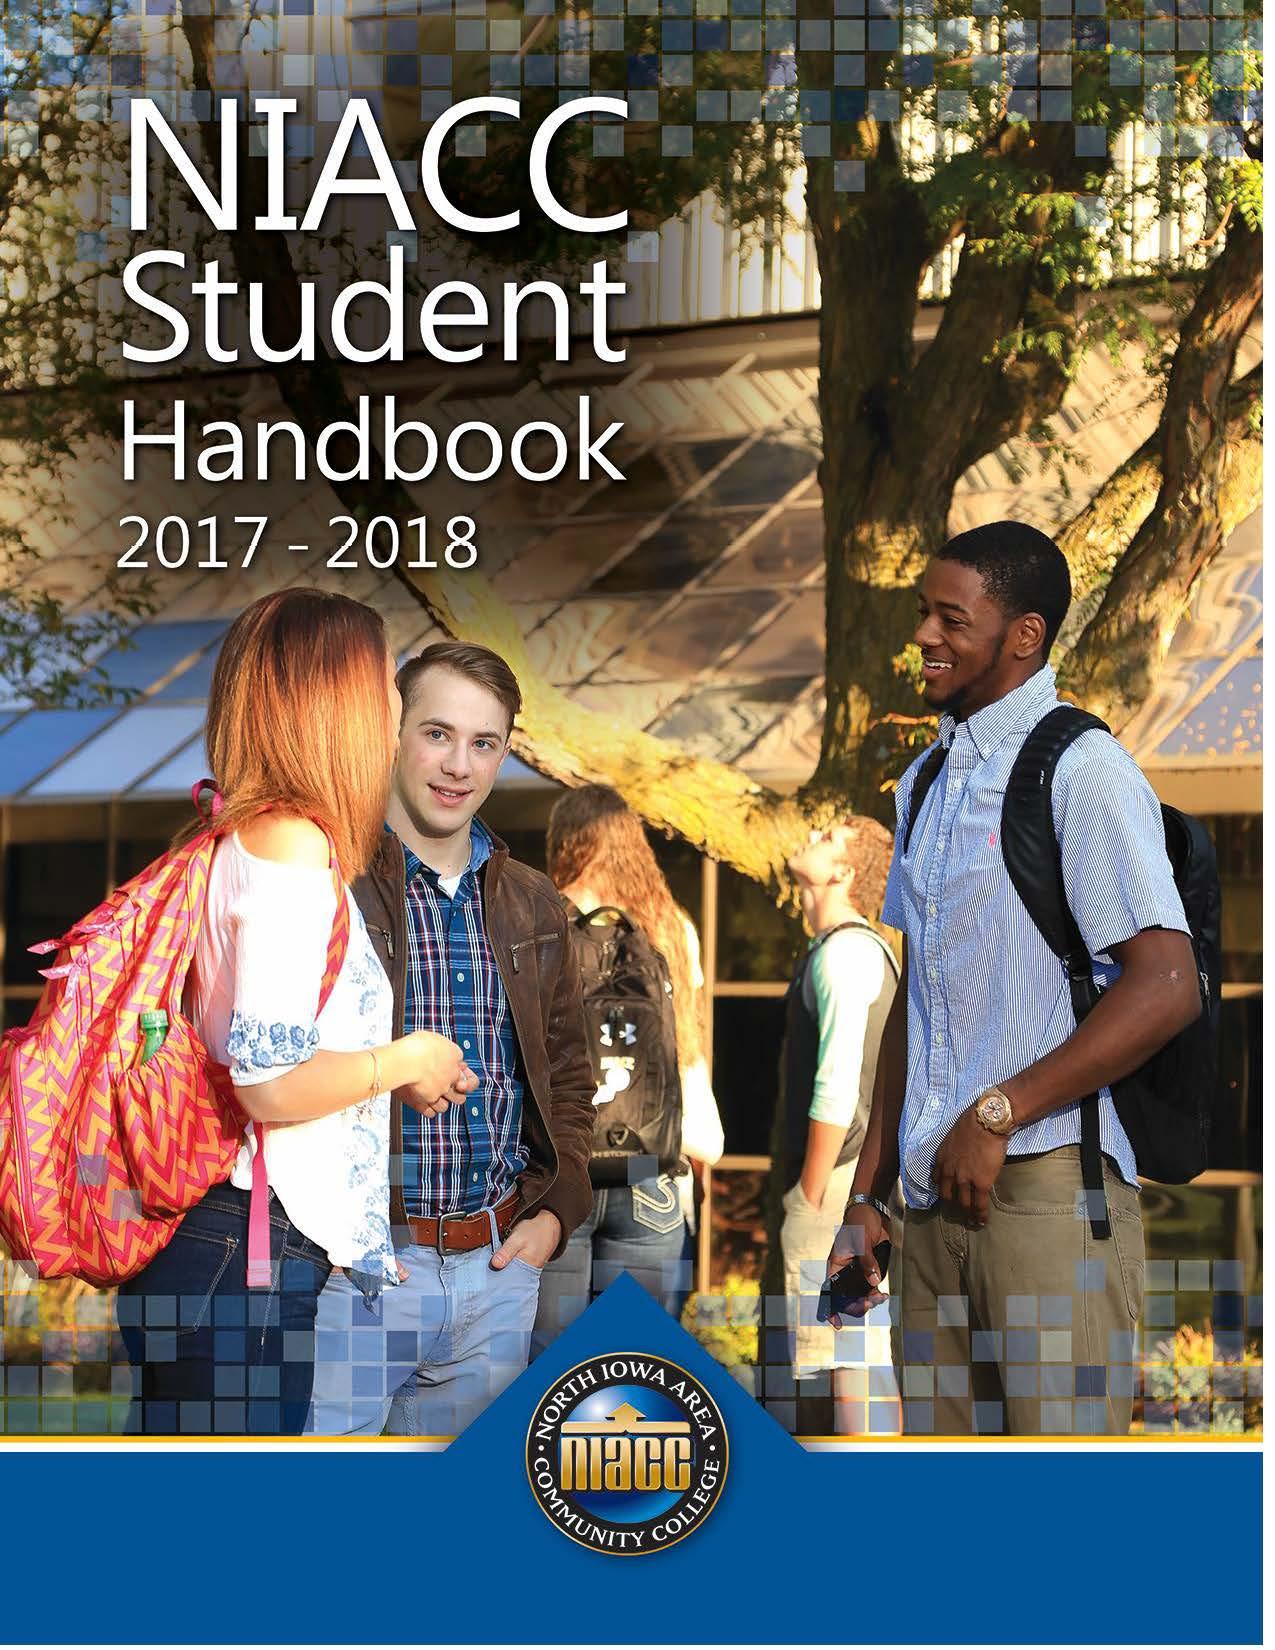 Student Handbook cover 2017